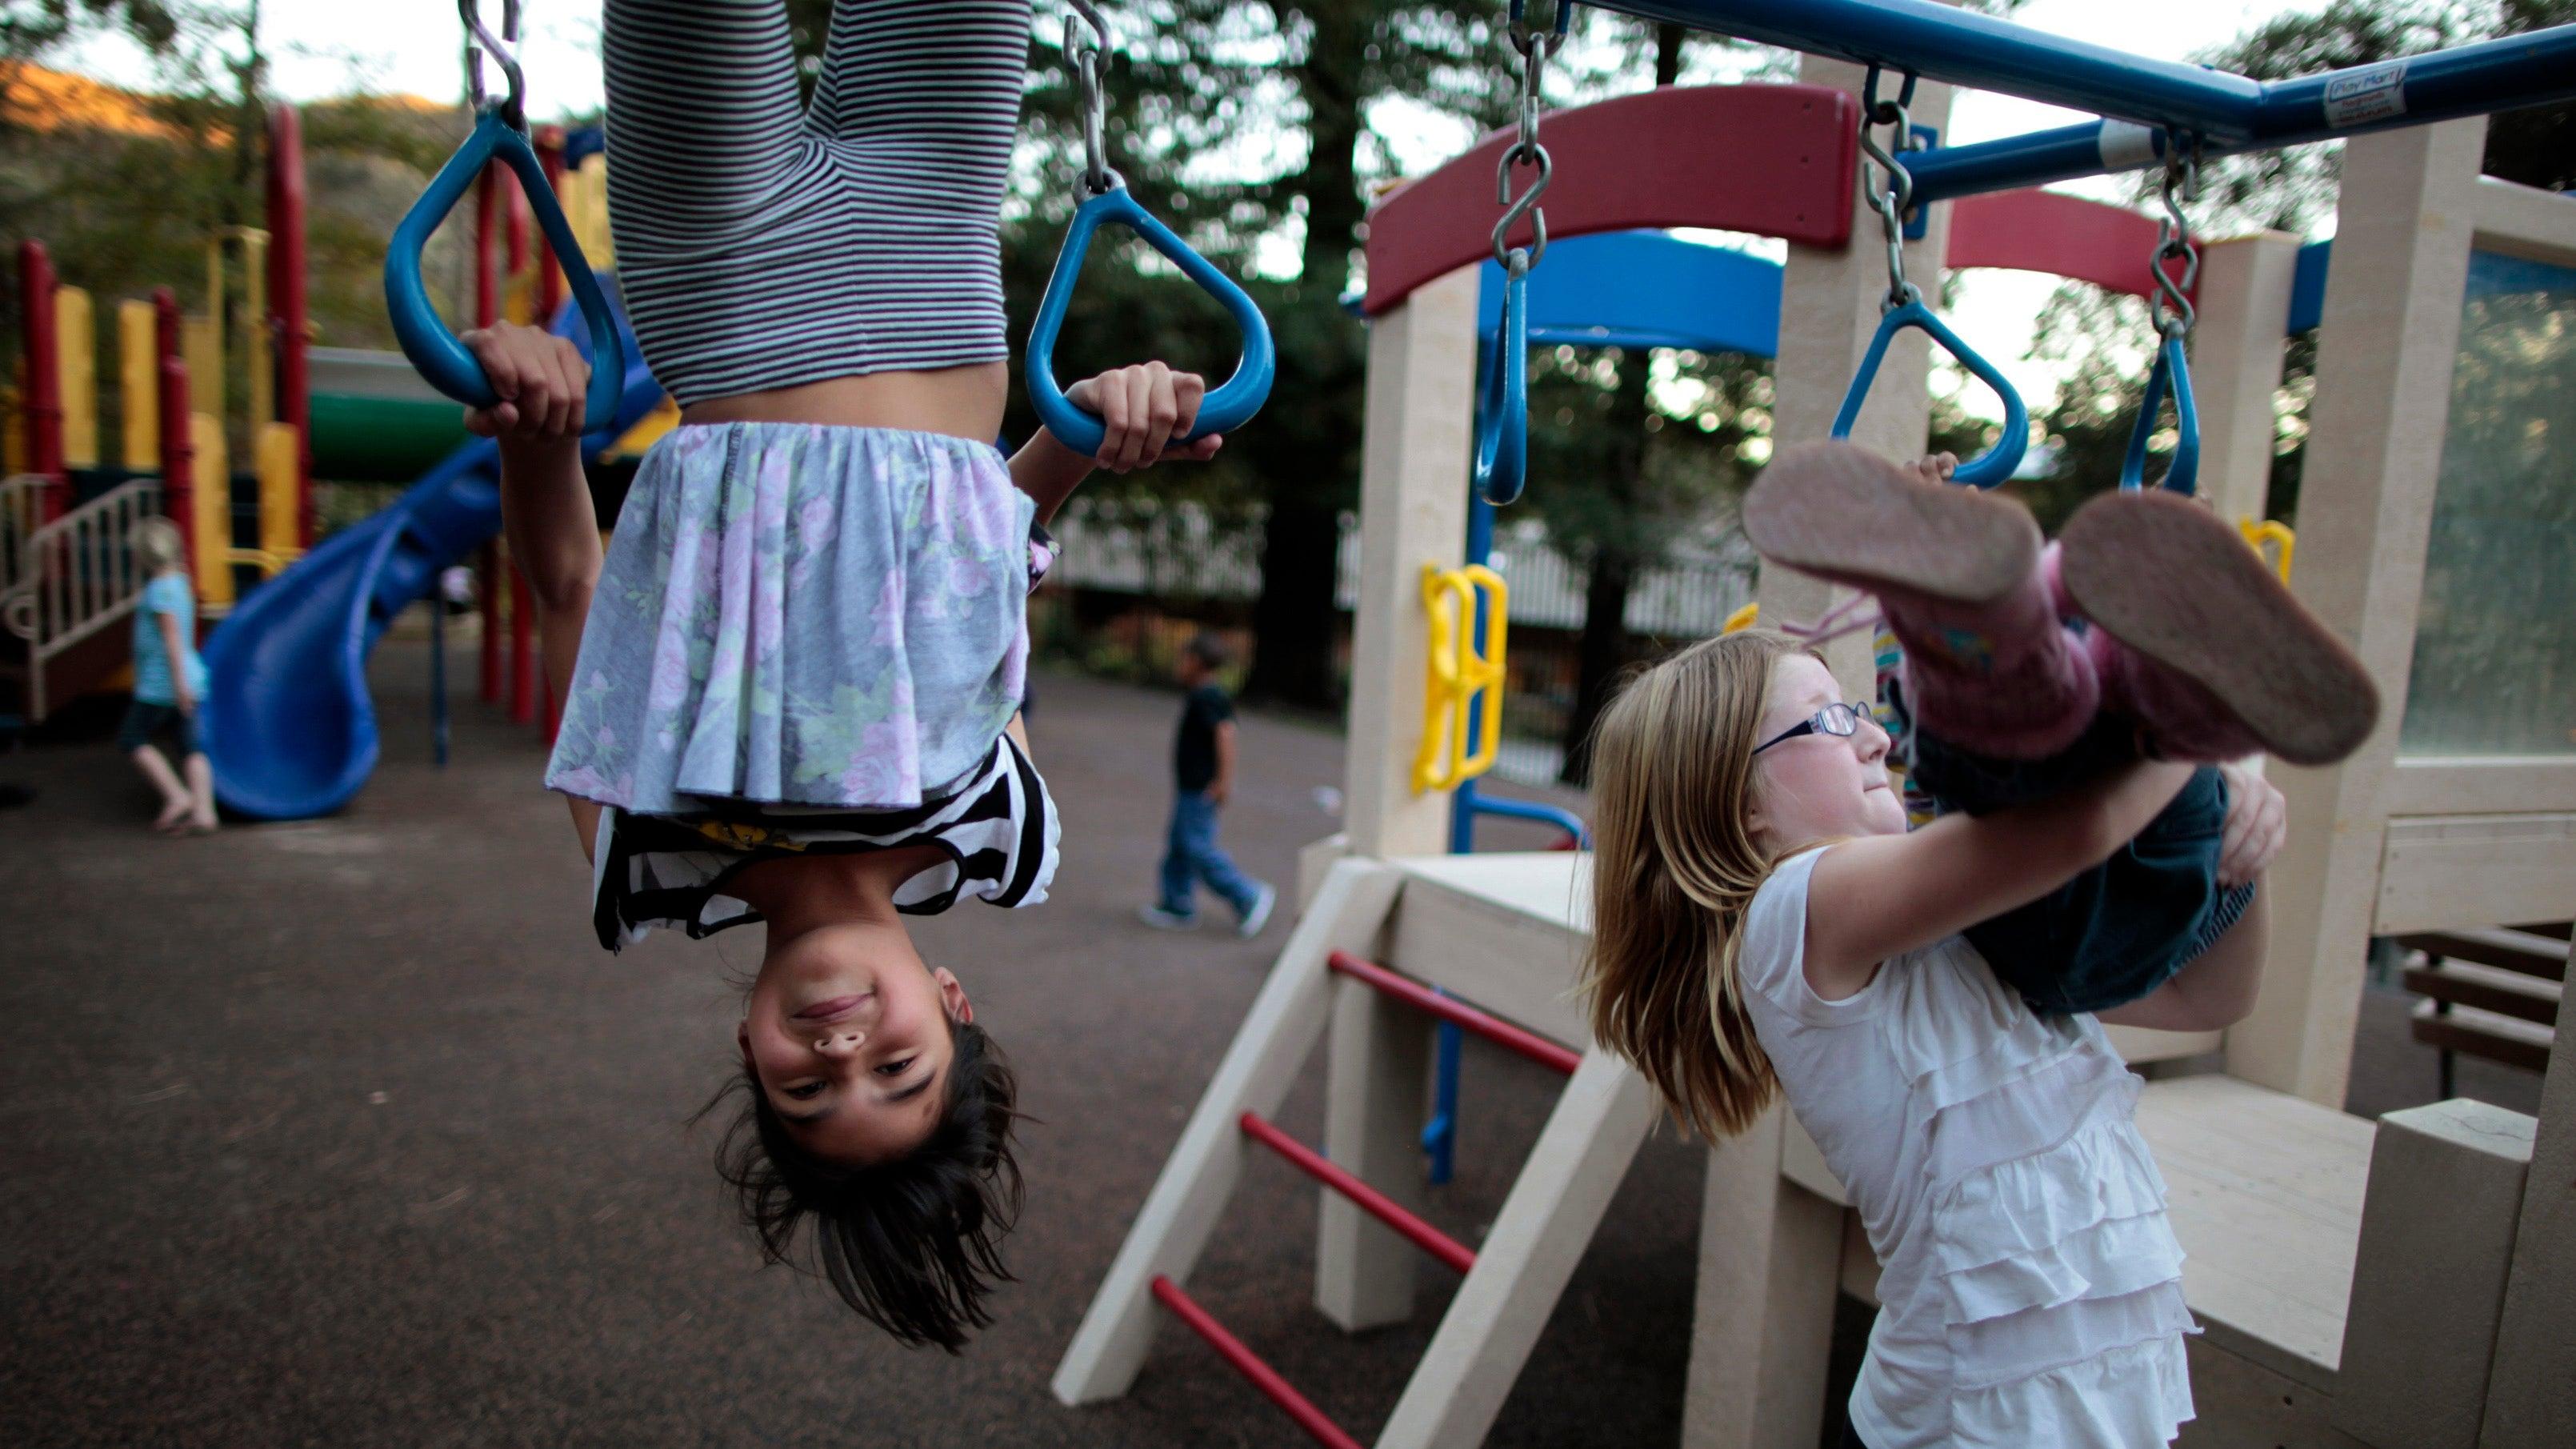 Pediatricians say kids need recess during school | Fox News